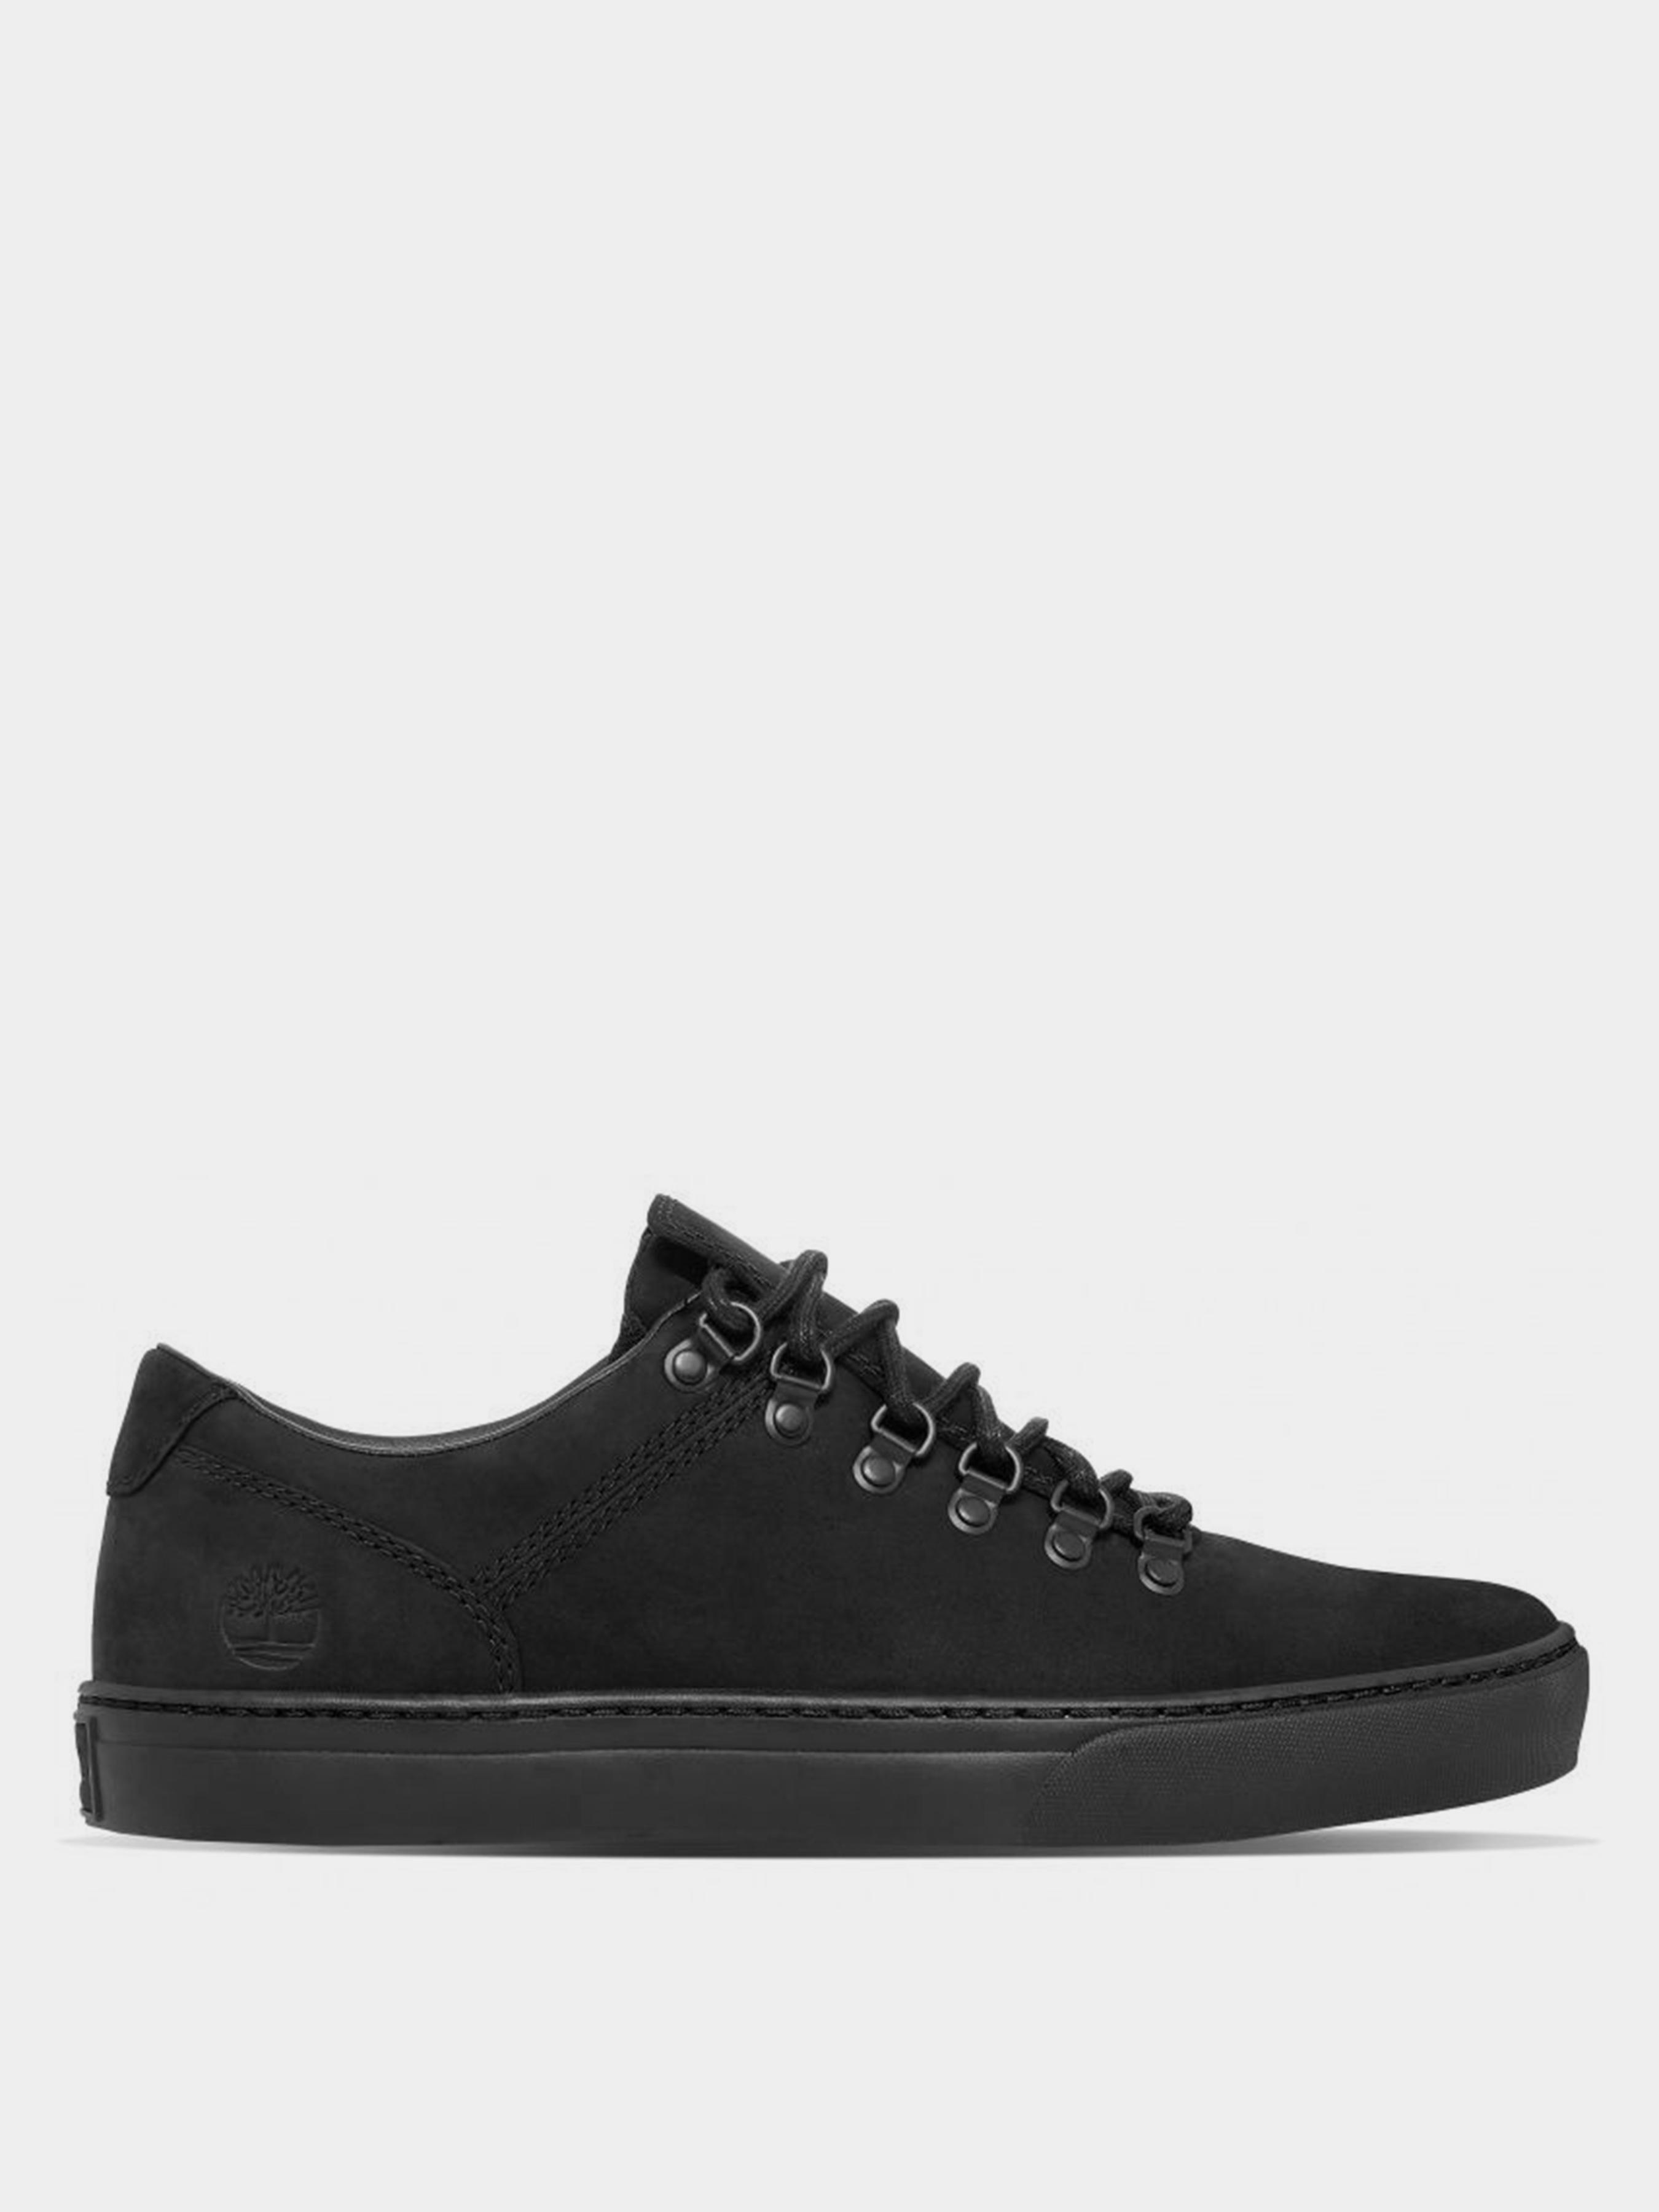 Полуботинки для мужчин Timberland Adventure 2.0 TF3898 брендовая обувь, 2017